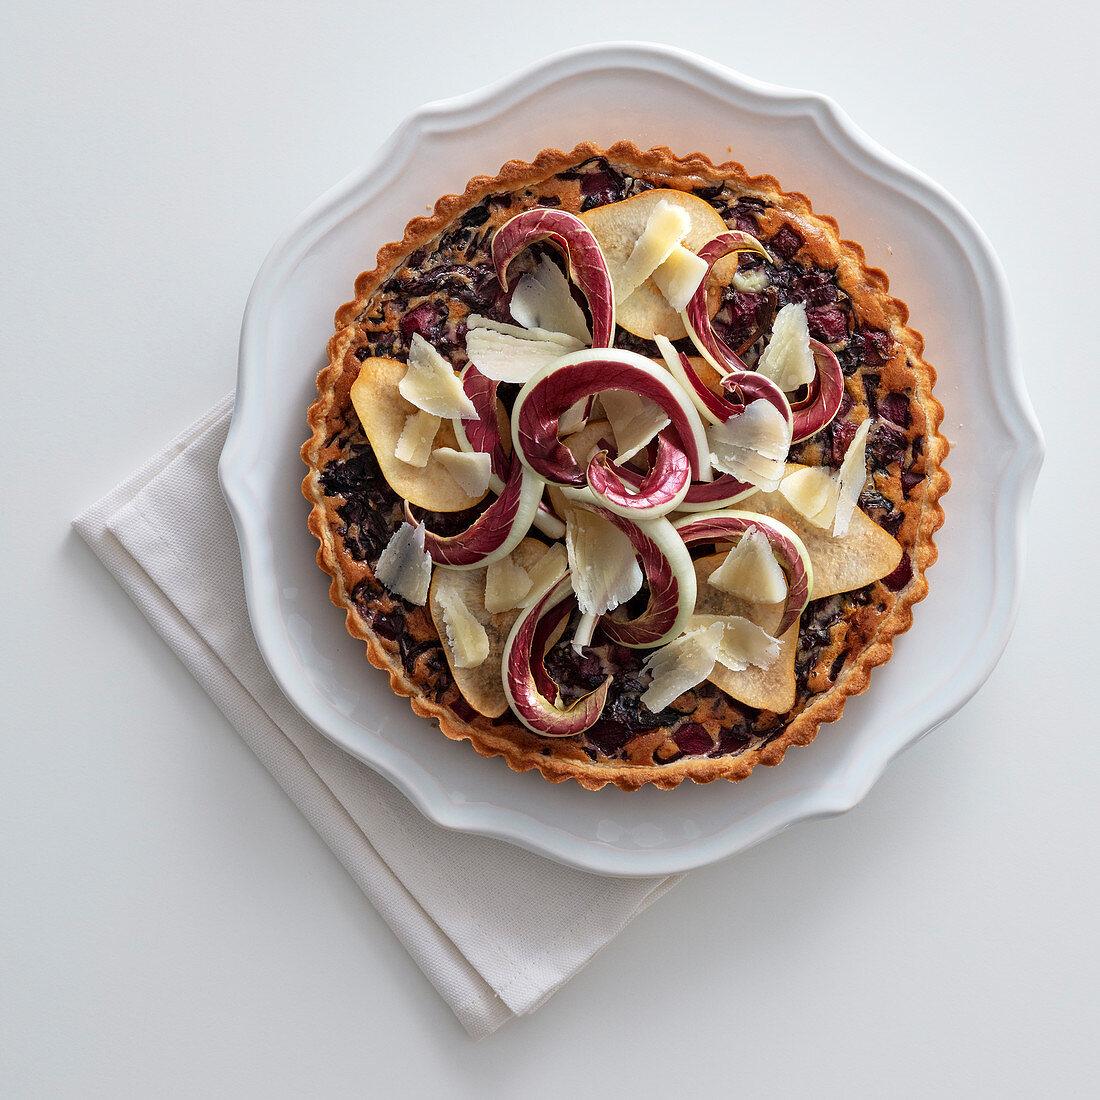 Radicchio and pear tart